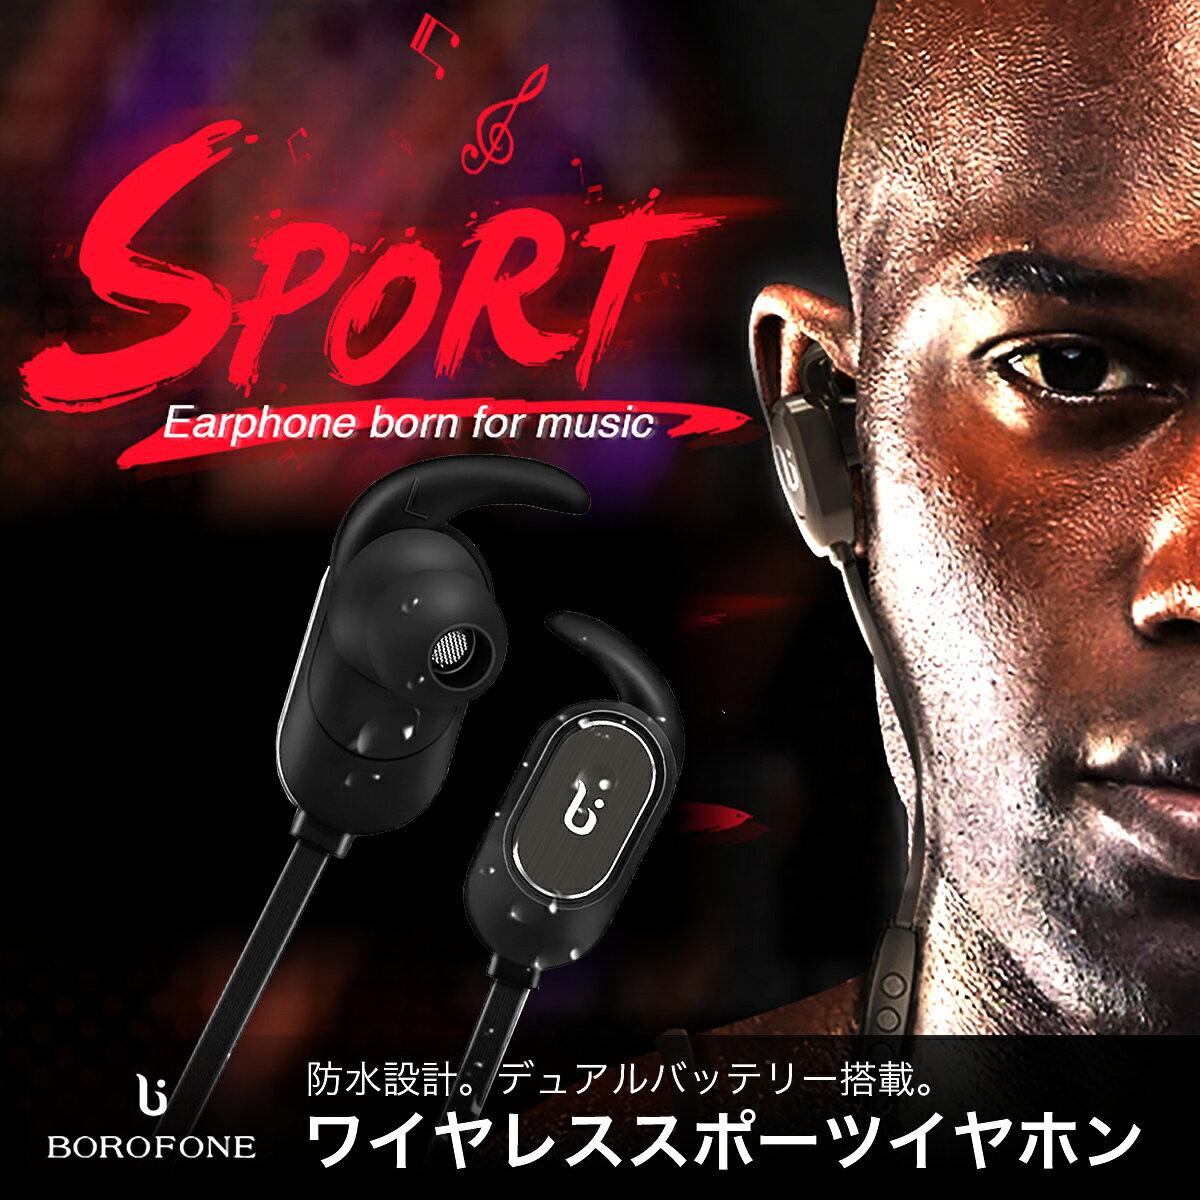 Bluetooth ワイヤレスイヤホン スポーツイヤホン ヘッドセット イヤホンマイク ハンズフリーヘッドセットワイヤレス イヤホン ランニング Bluetooth 送料無料 ボロフォン BOROFONE borofone-be2